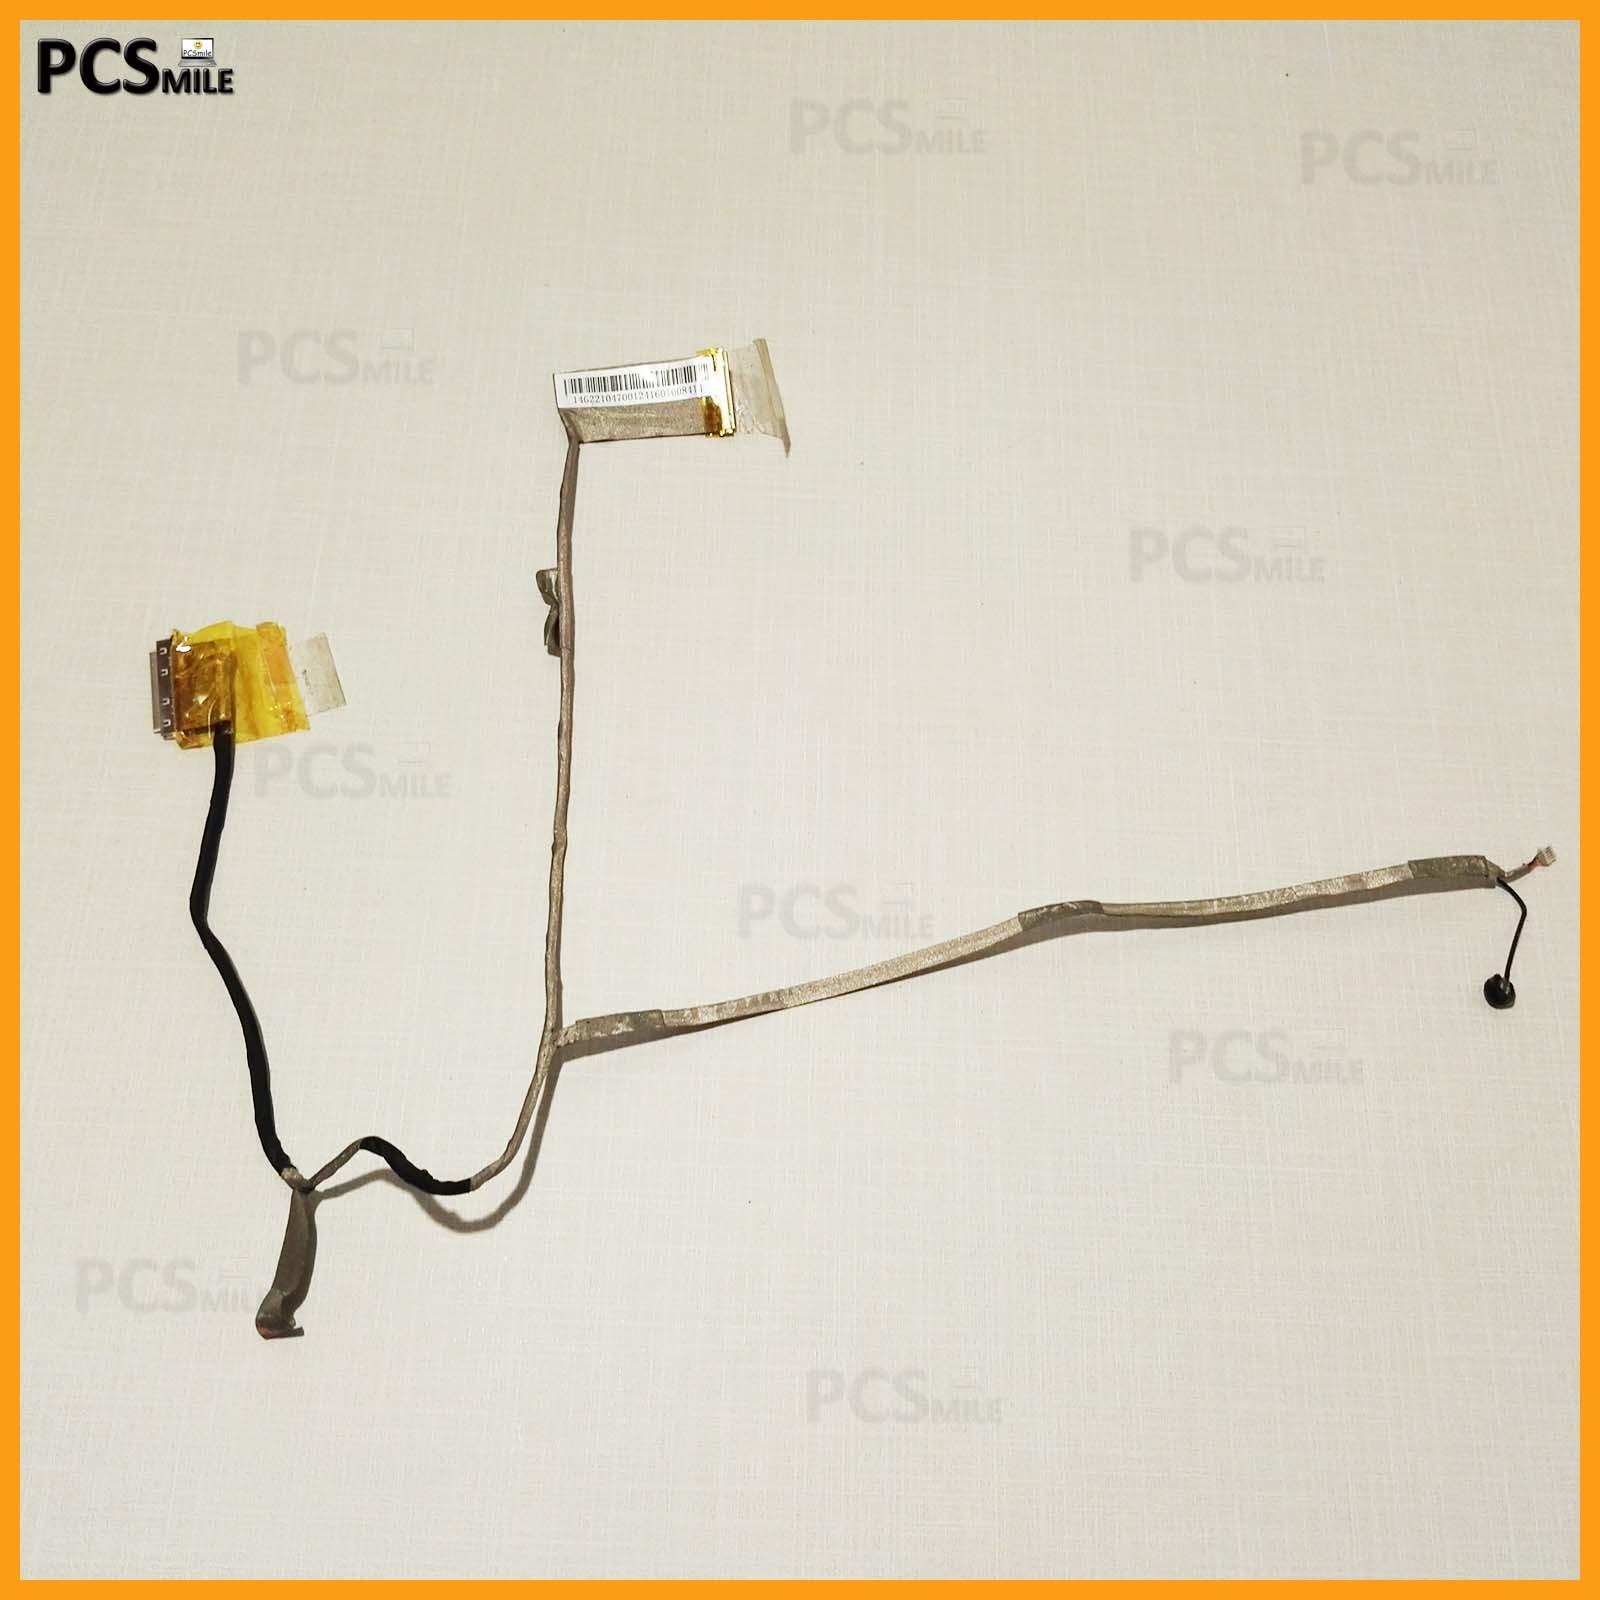 Flat ORIGINALE Asus K54C 14G221047001241601008414 cavo LCD collegamento Display